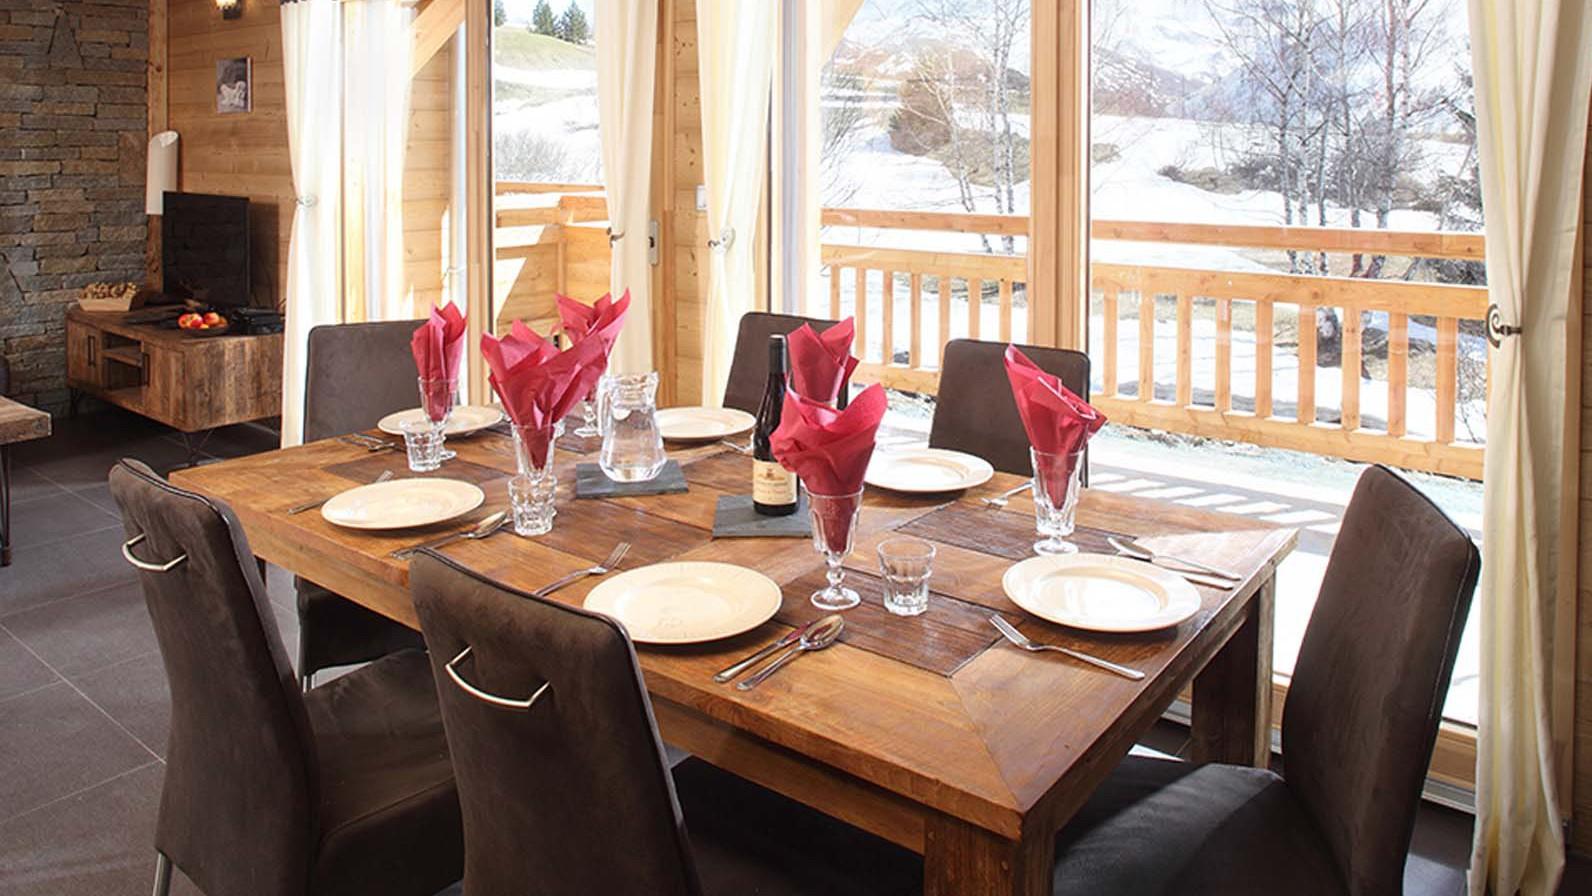 Dining Area, Chalet Friandise, Alpe D'Huez, France